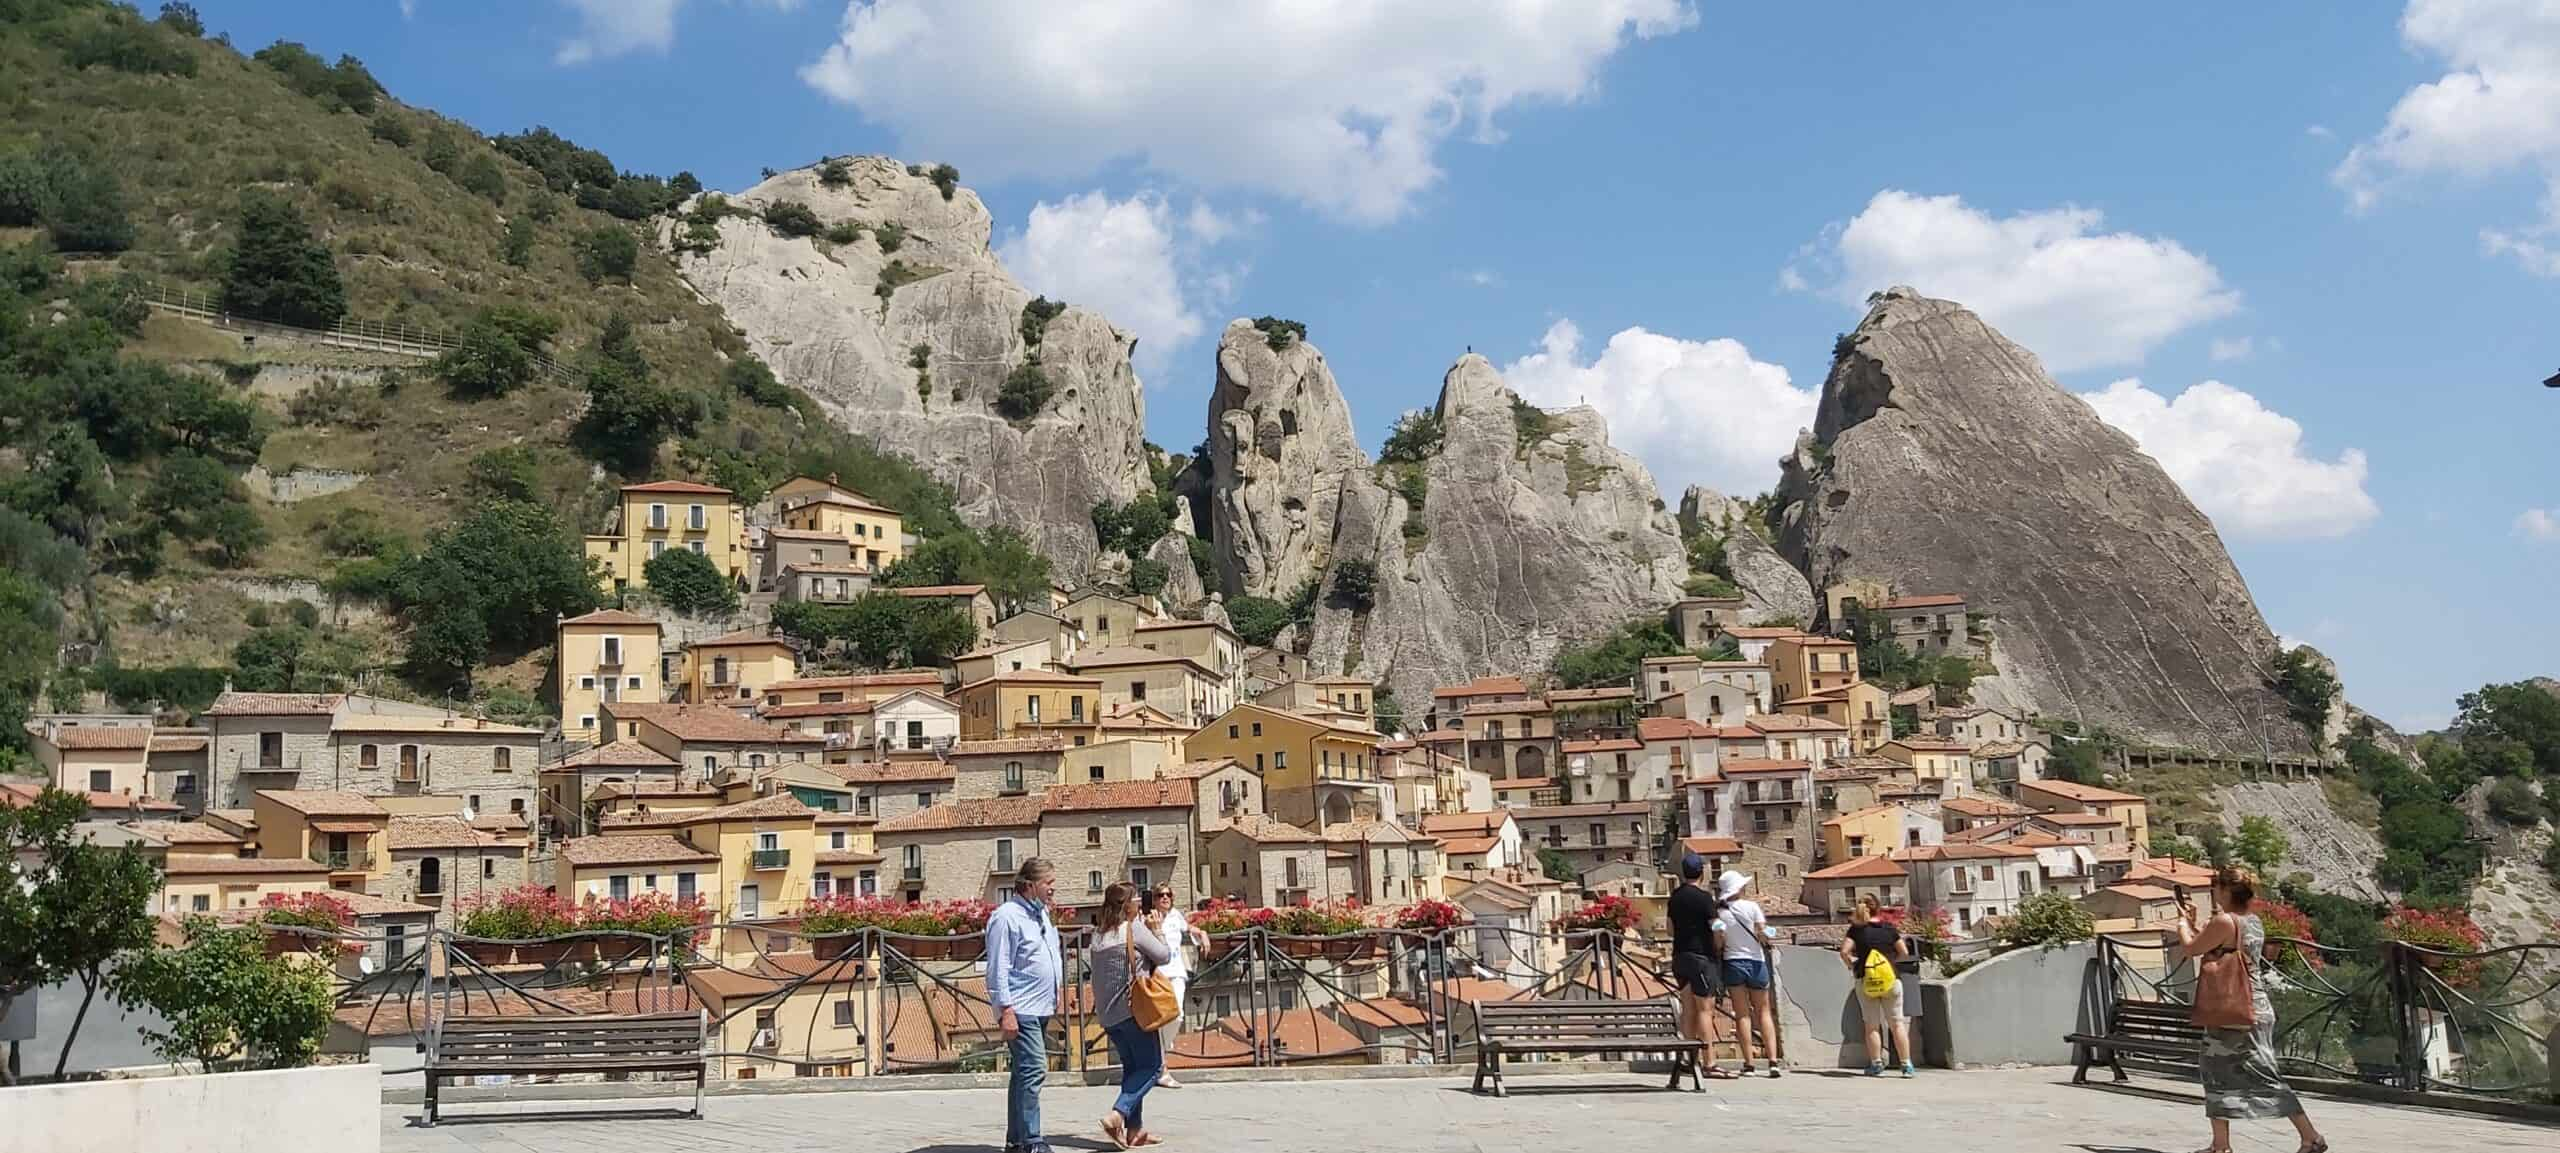 Prenota visite guidate e viaggi culturali in Puglia e Basilicata